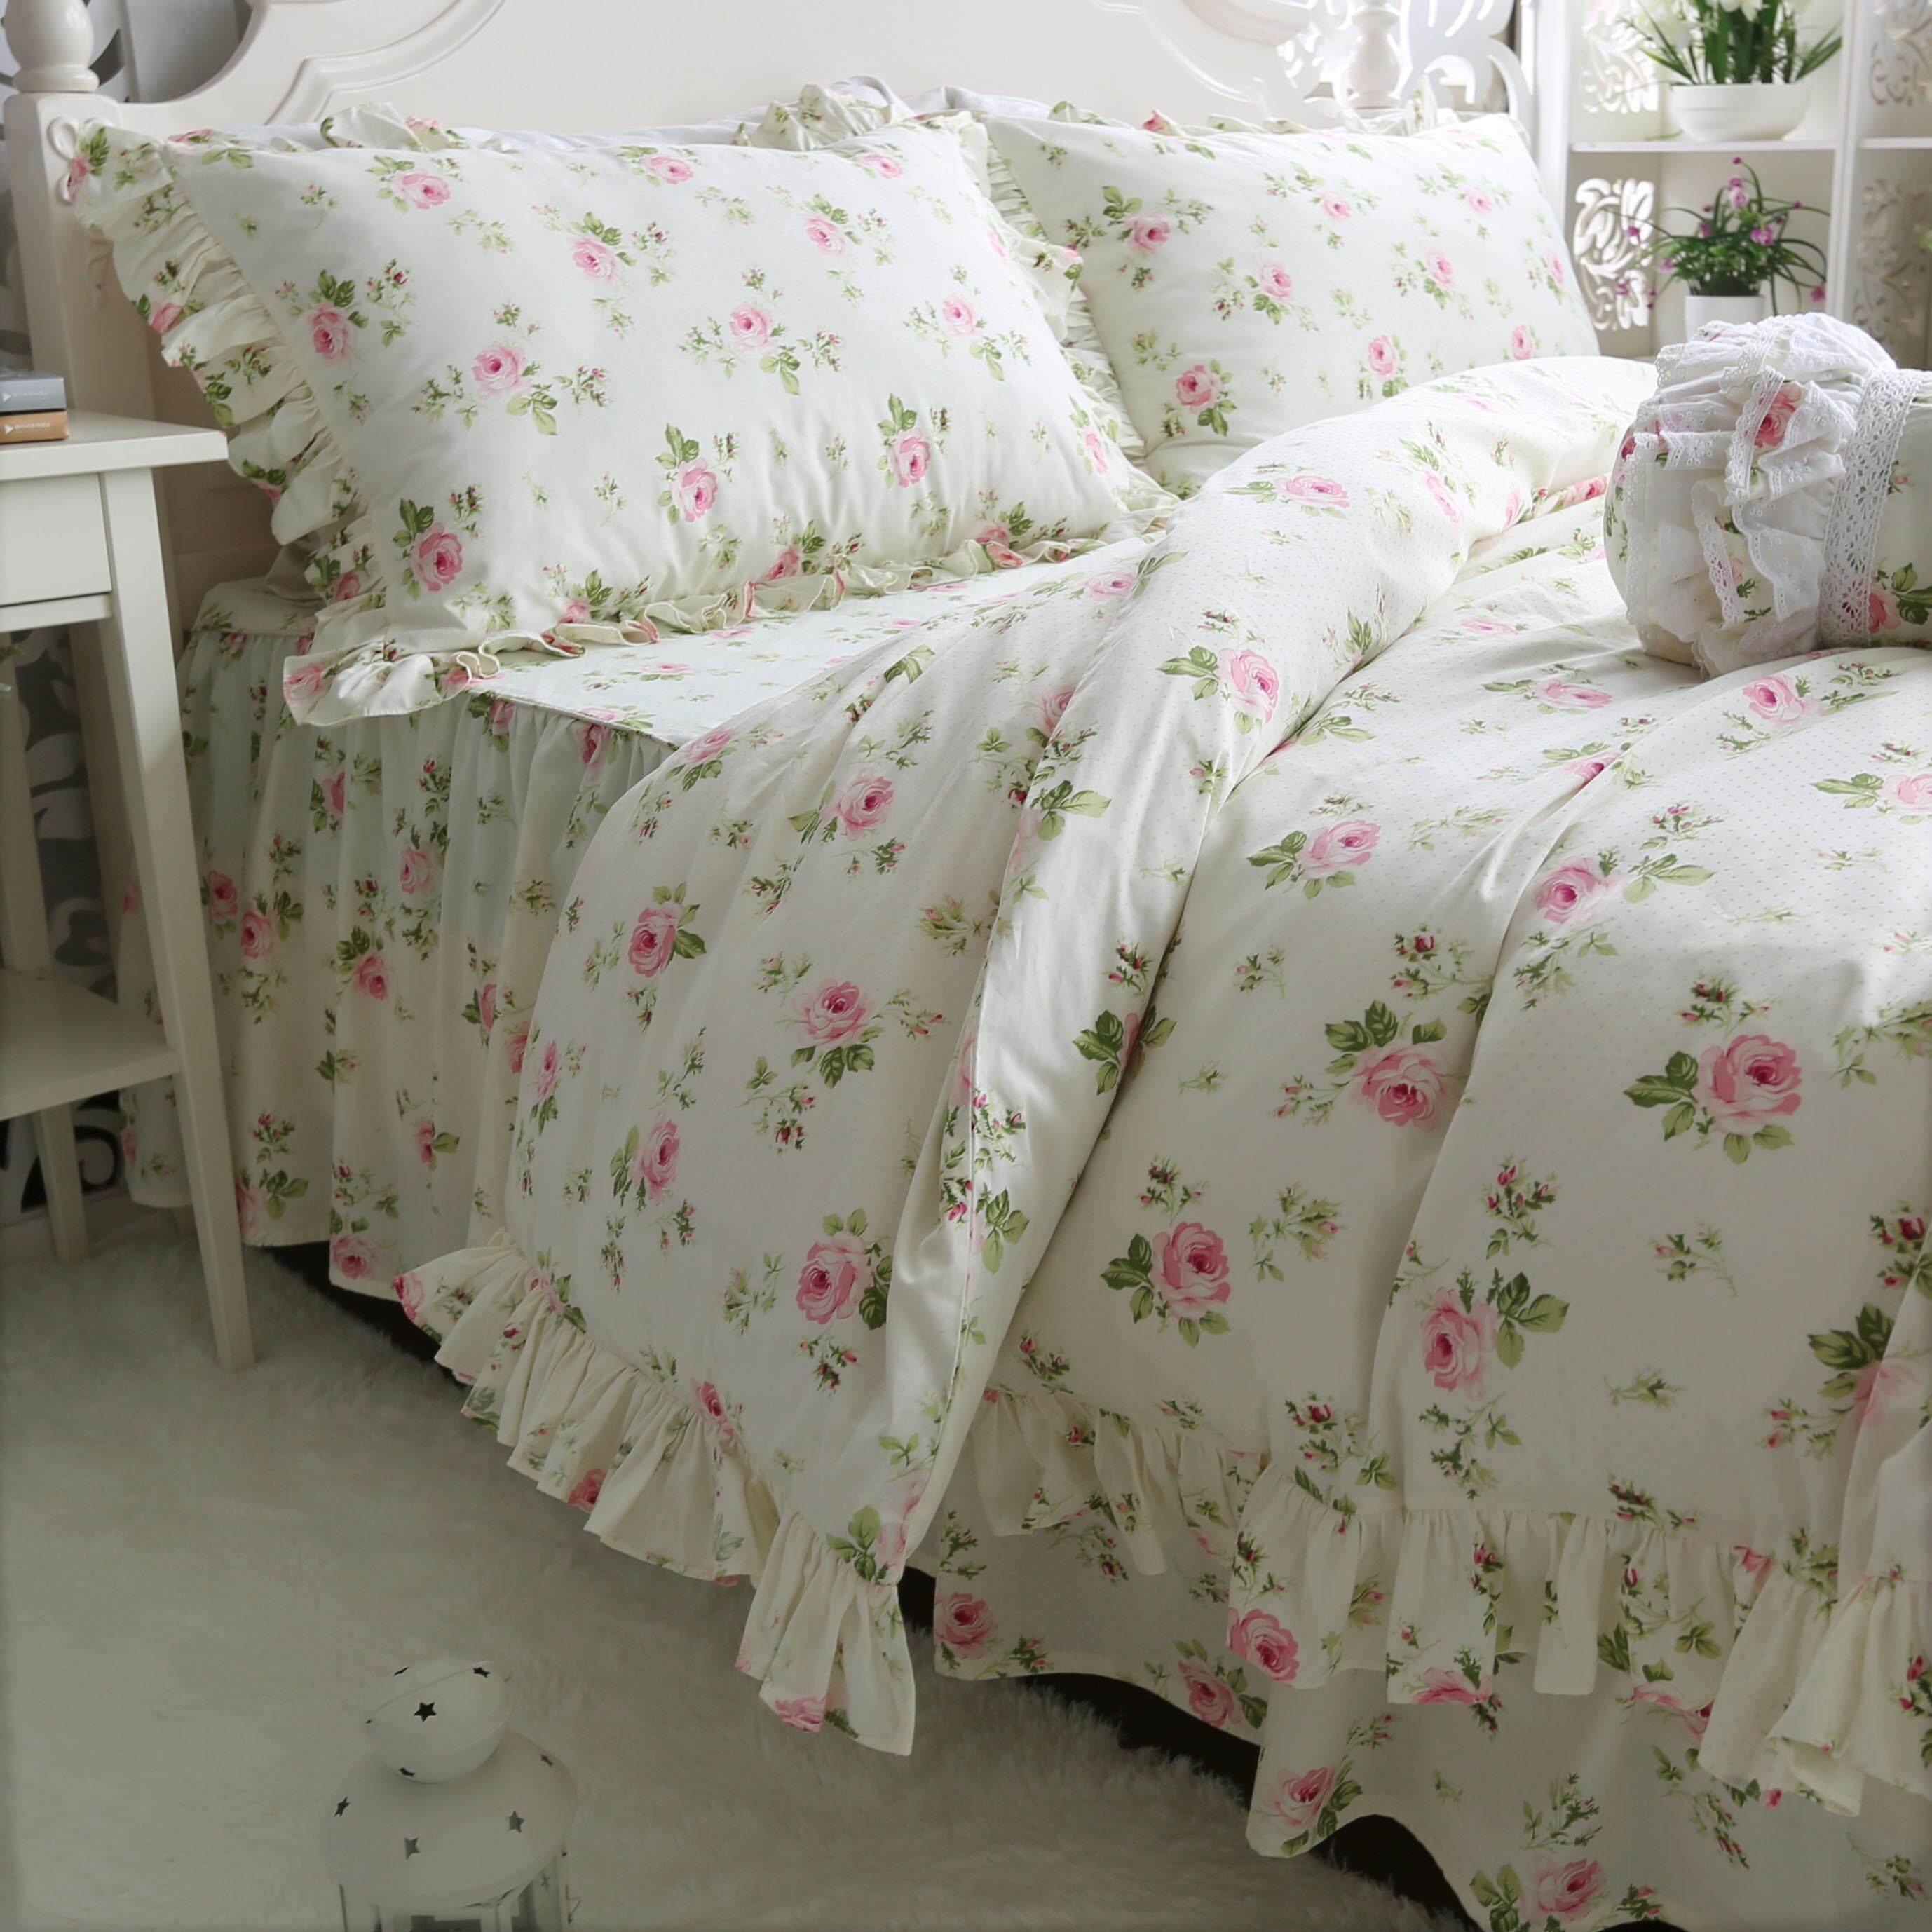 ... Anak Gadis Fashion 3 Set Pakaian-. Source · 4Pcs/Set Katun Murni Twill Sarung Selimut Tumbuhan Bunga-bungaan